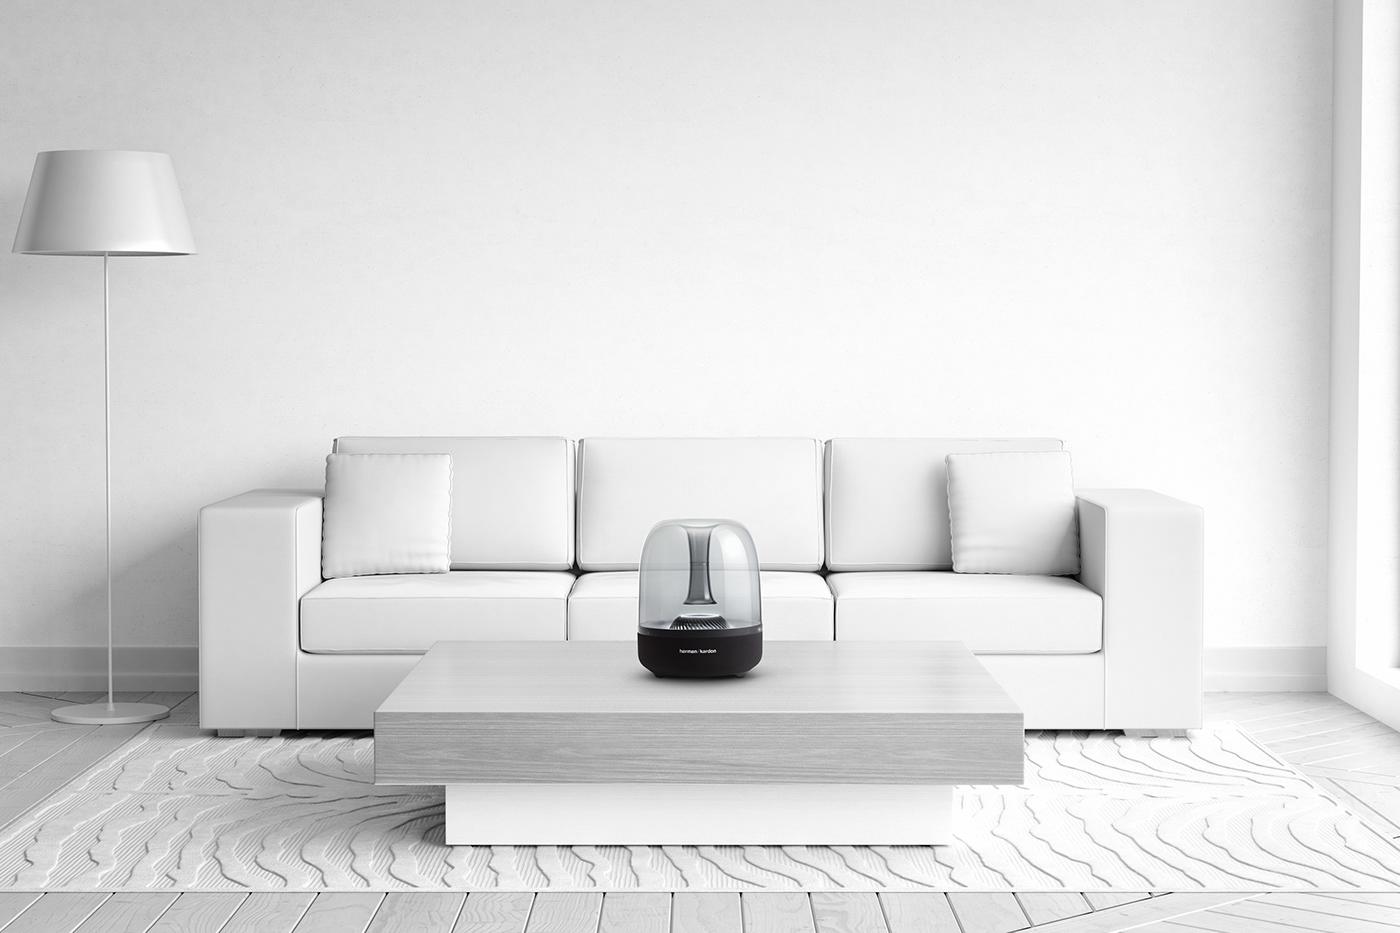 e-commerce Harman Kardon redesign ux/ui